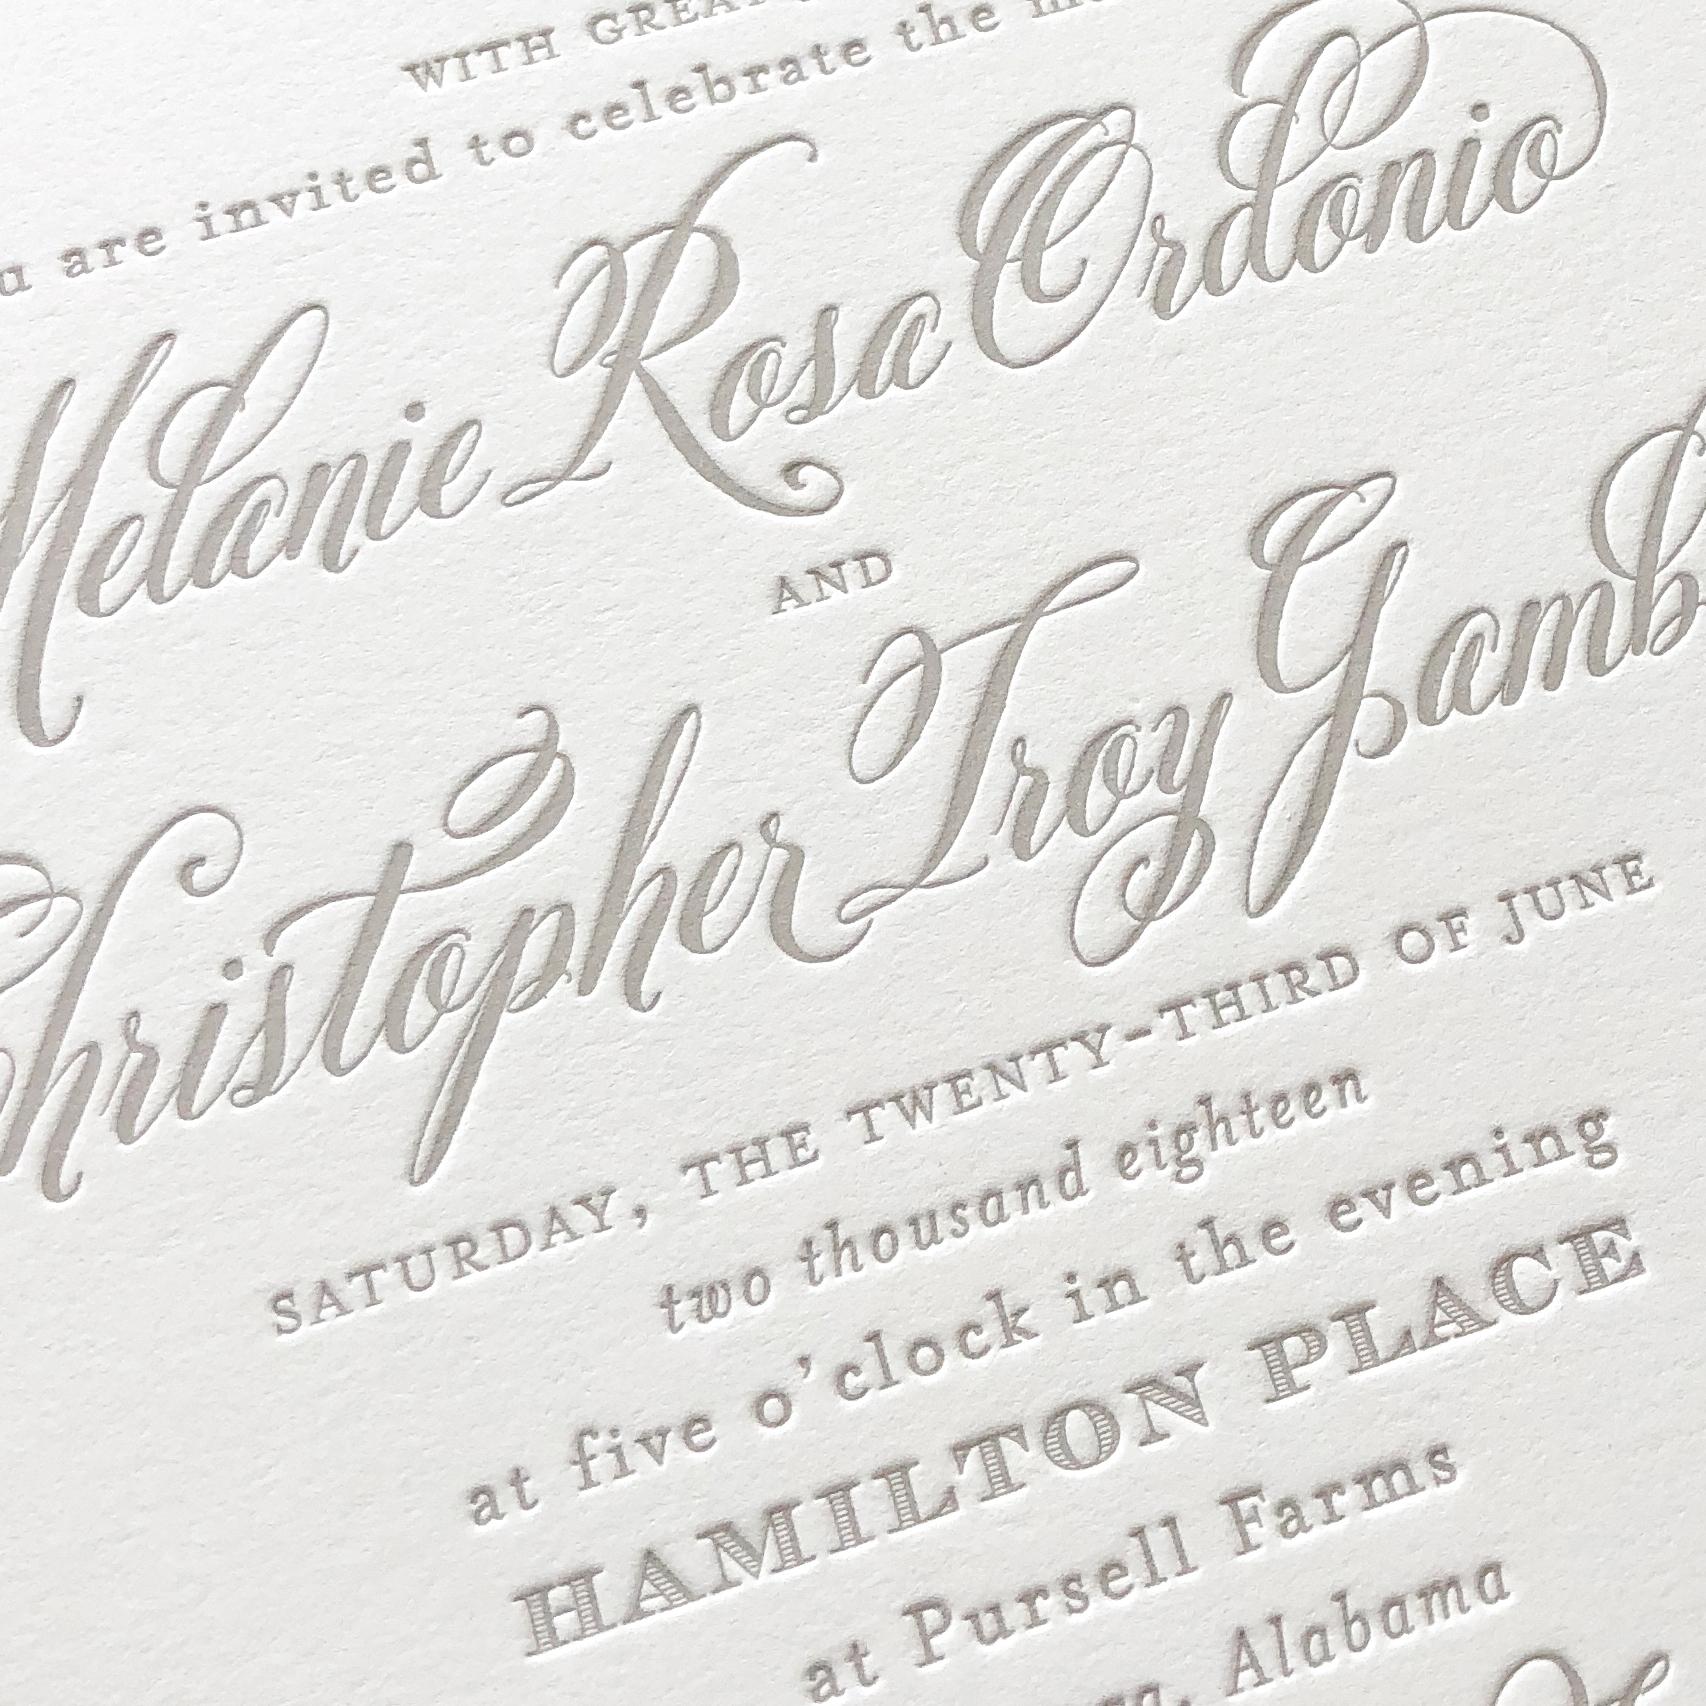 A sample of Letterpress Printing